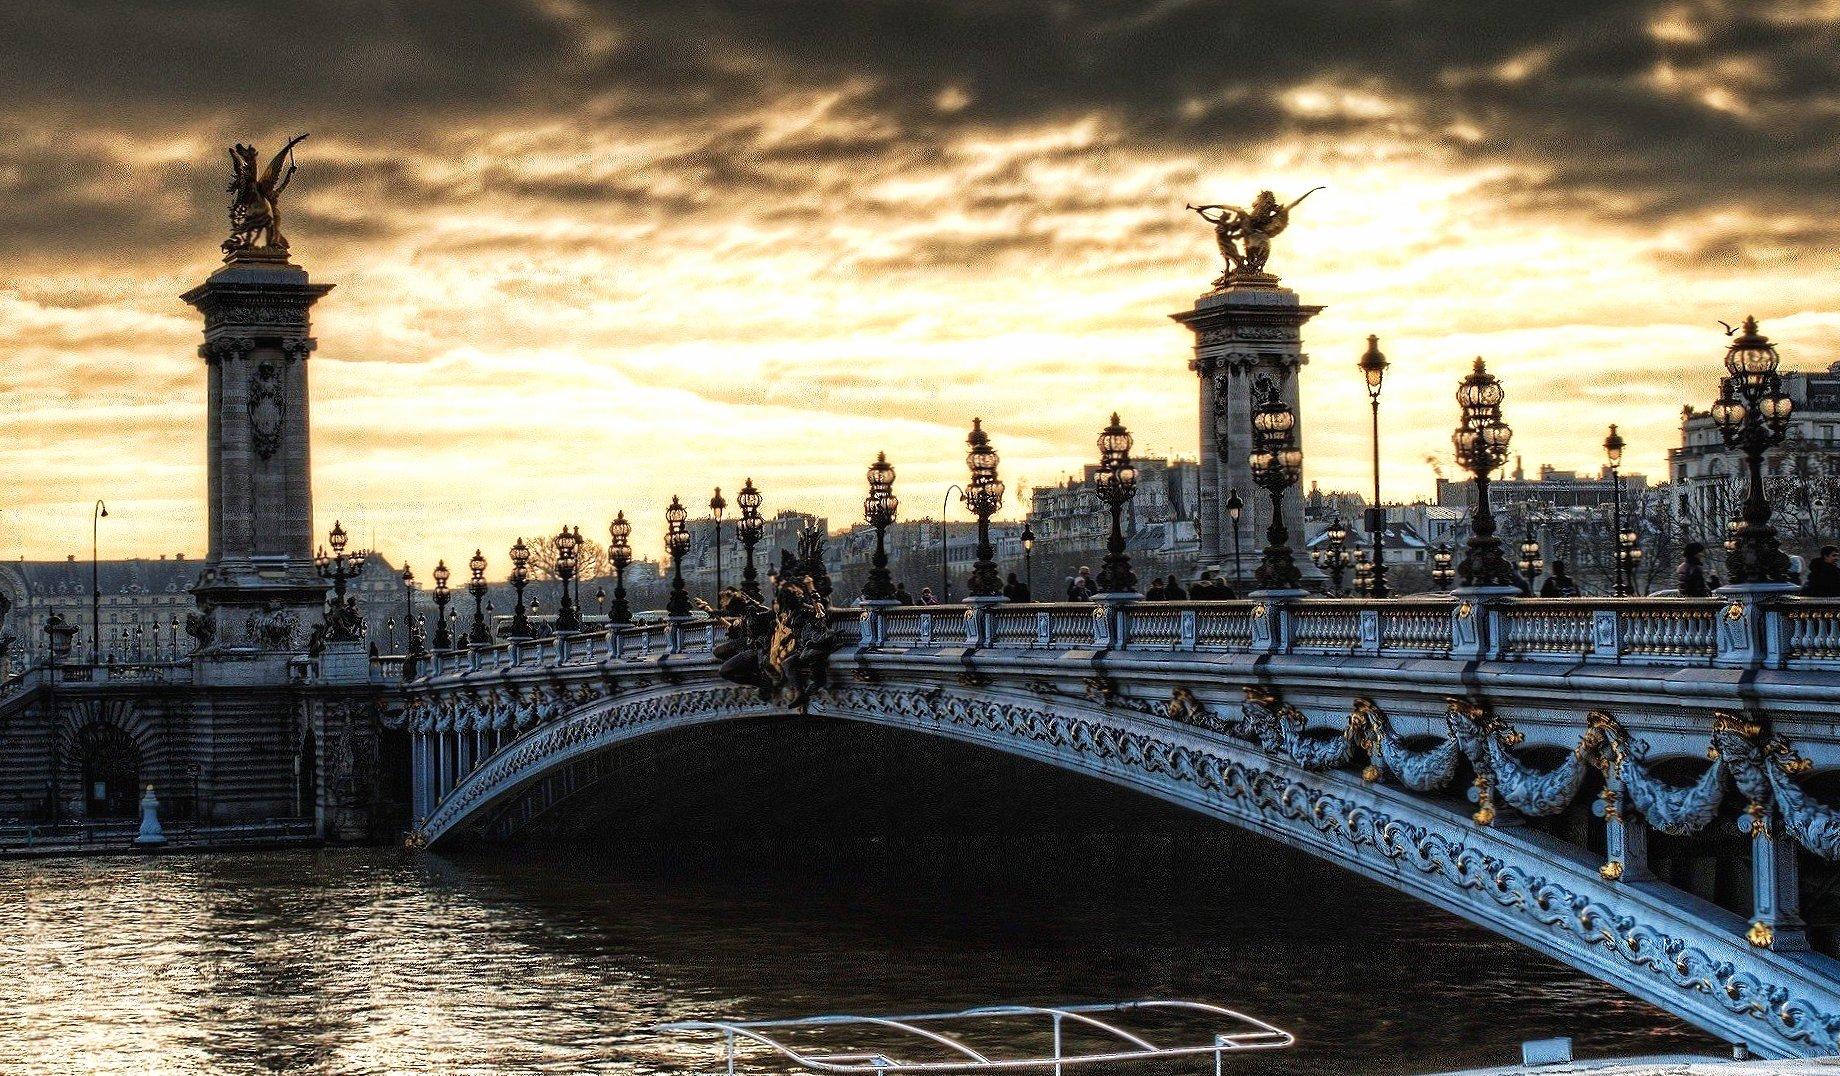 Bridge in paris wallpapers HD quality